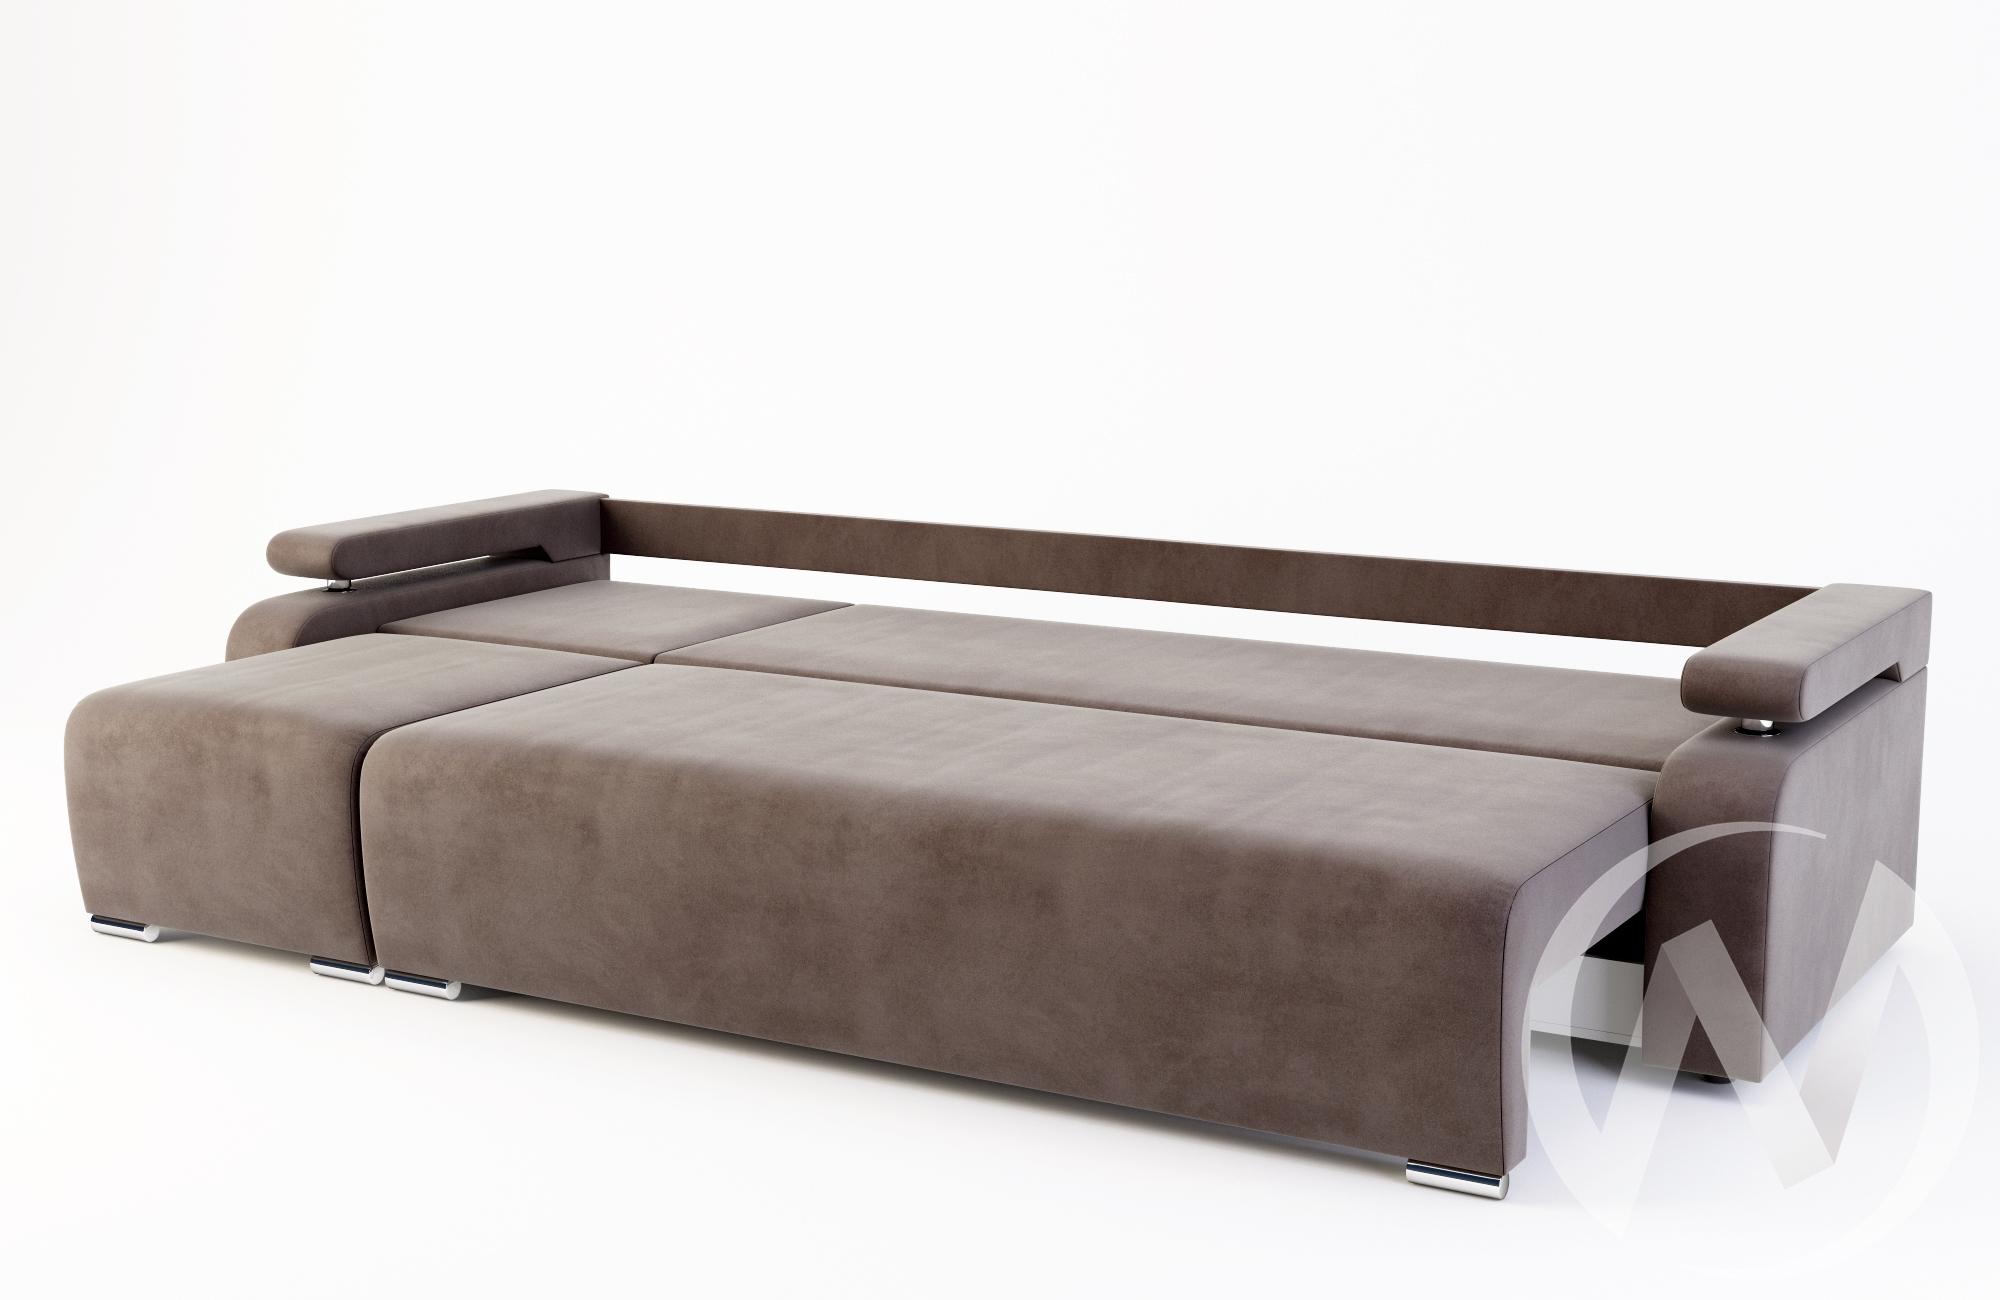 Диван-трансформер Невада 3кат (Burn brown/Ice brown/Ice brown)  в Томске — интернет магазин МИРА-мебель